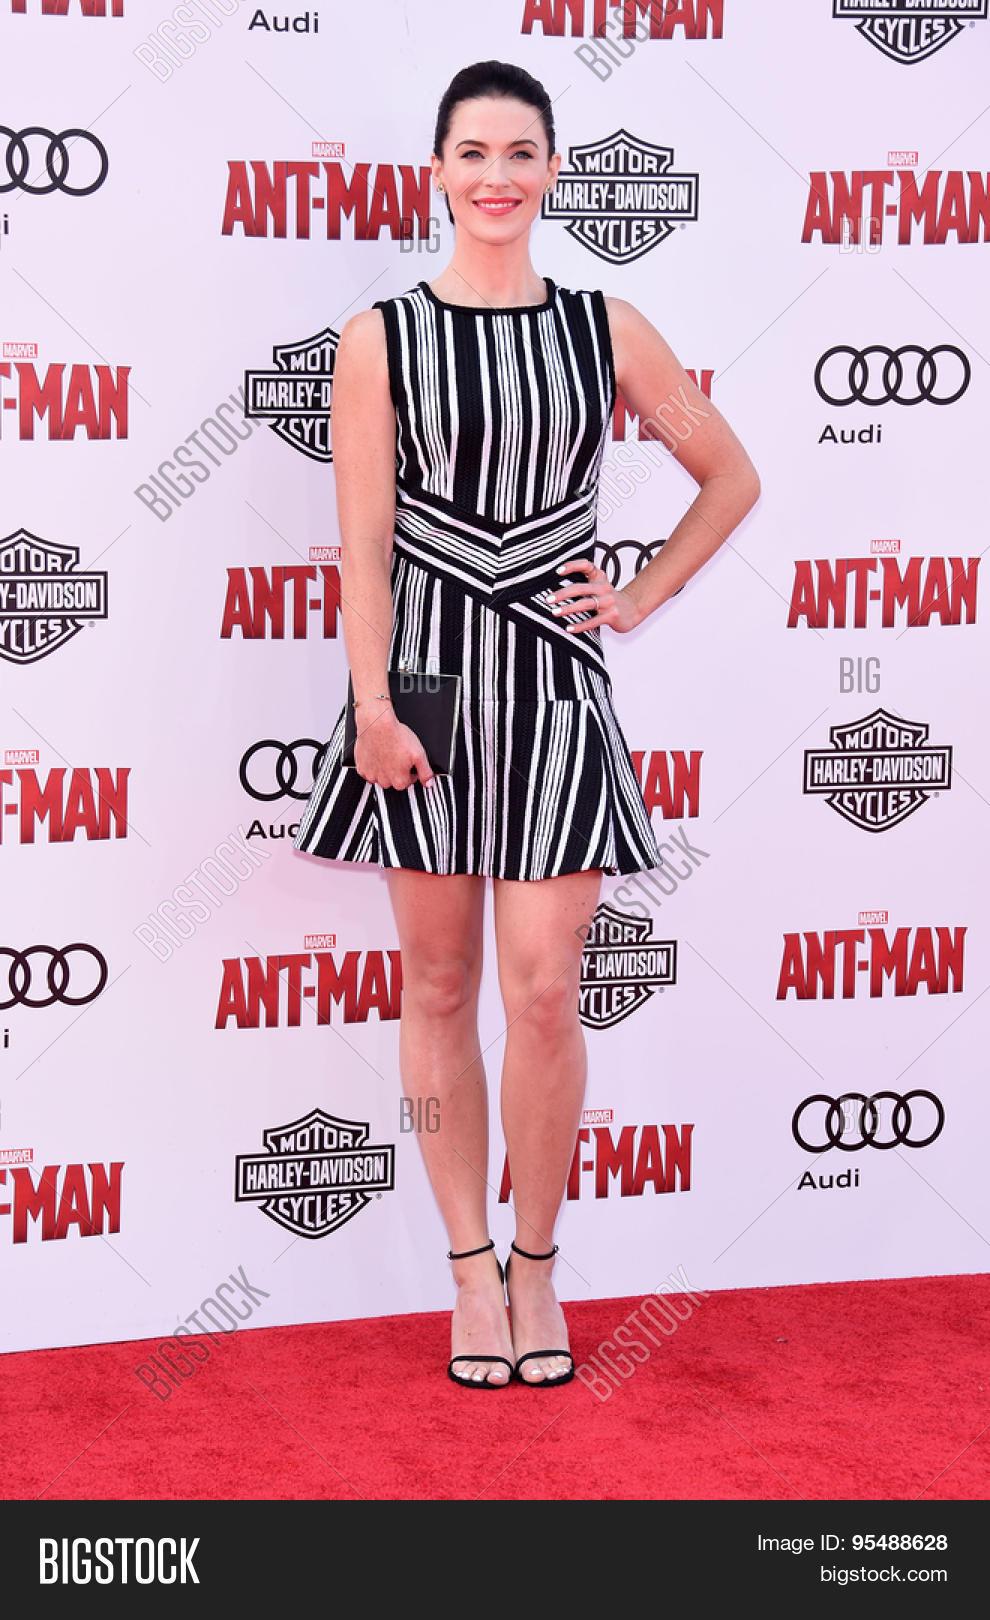 Los Angeles Jun 29 Bridget Regan Arrives To The Ant Man